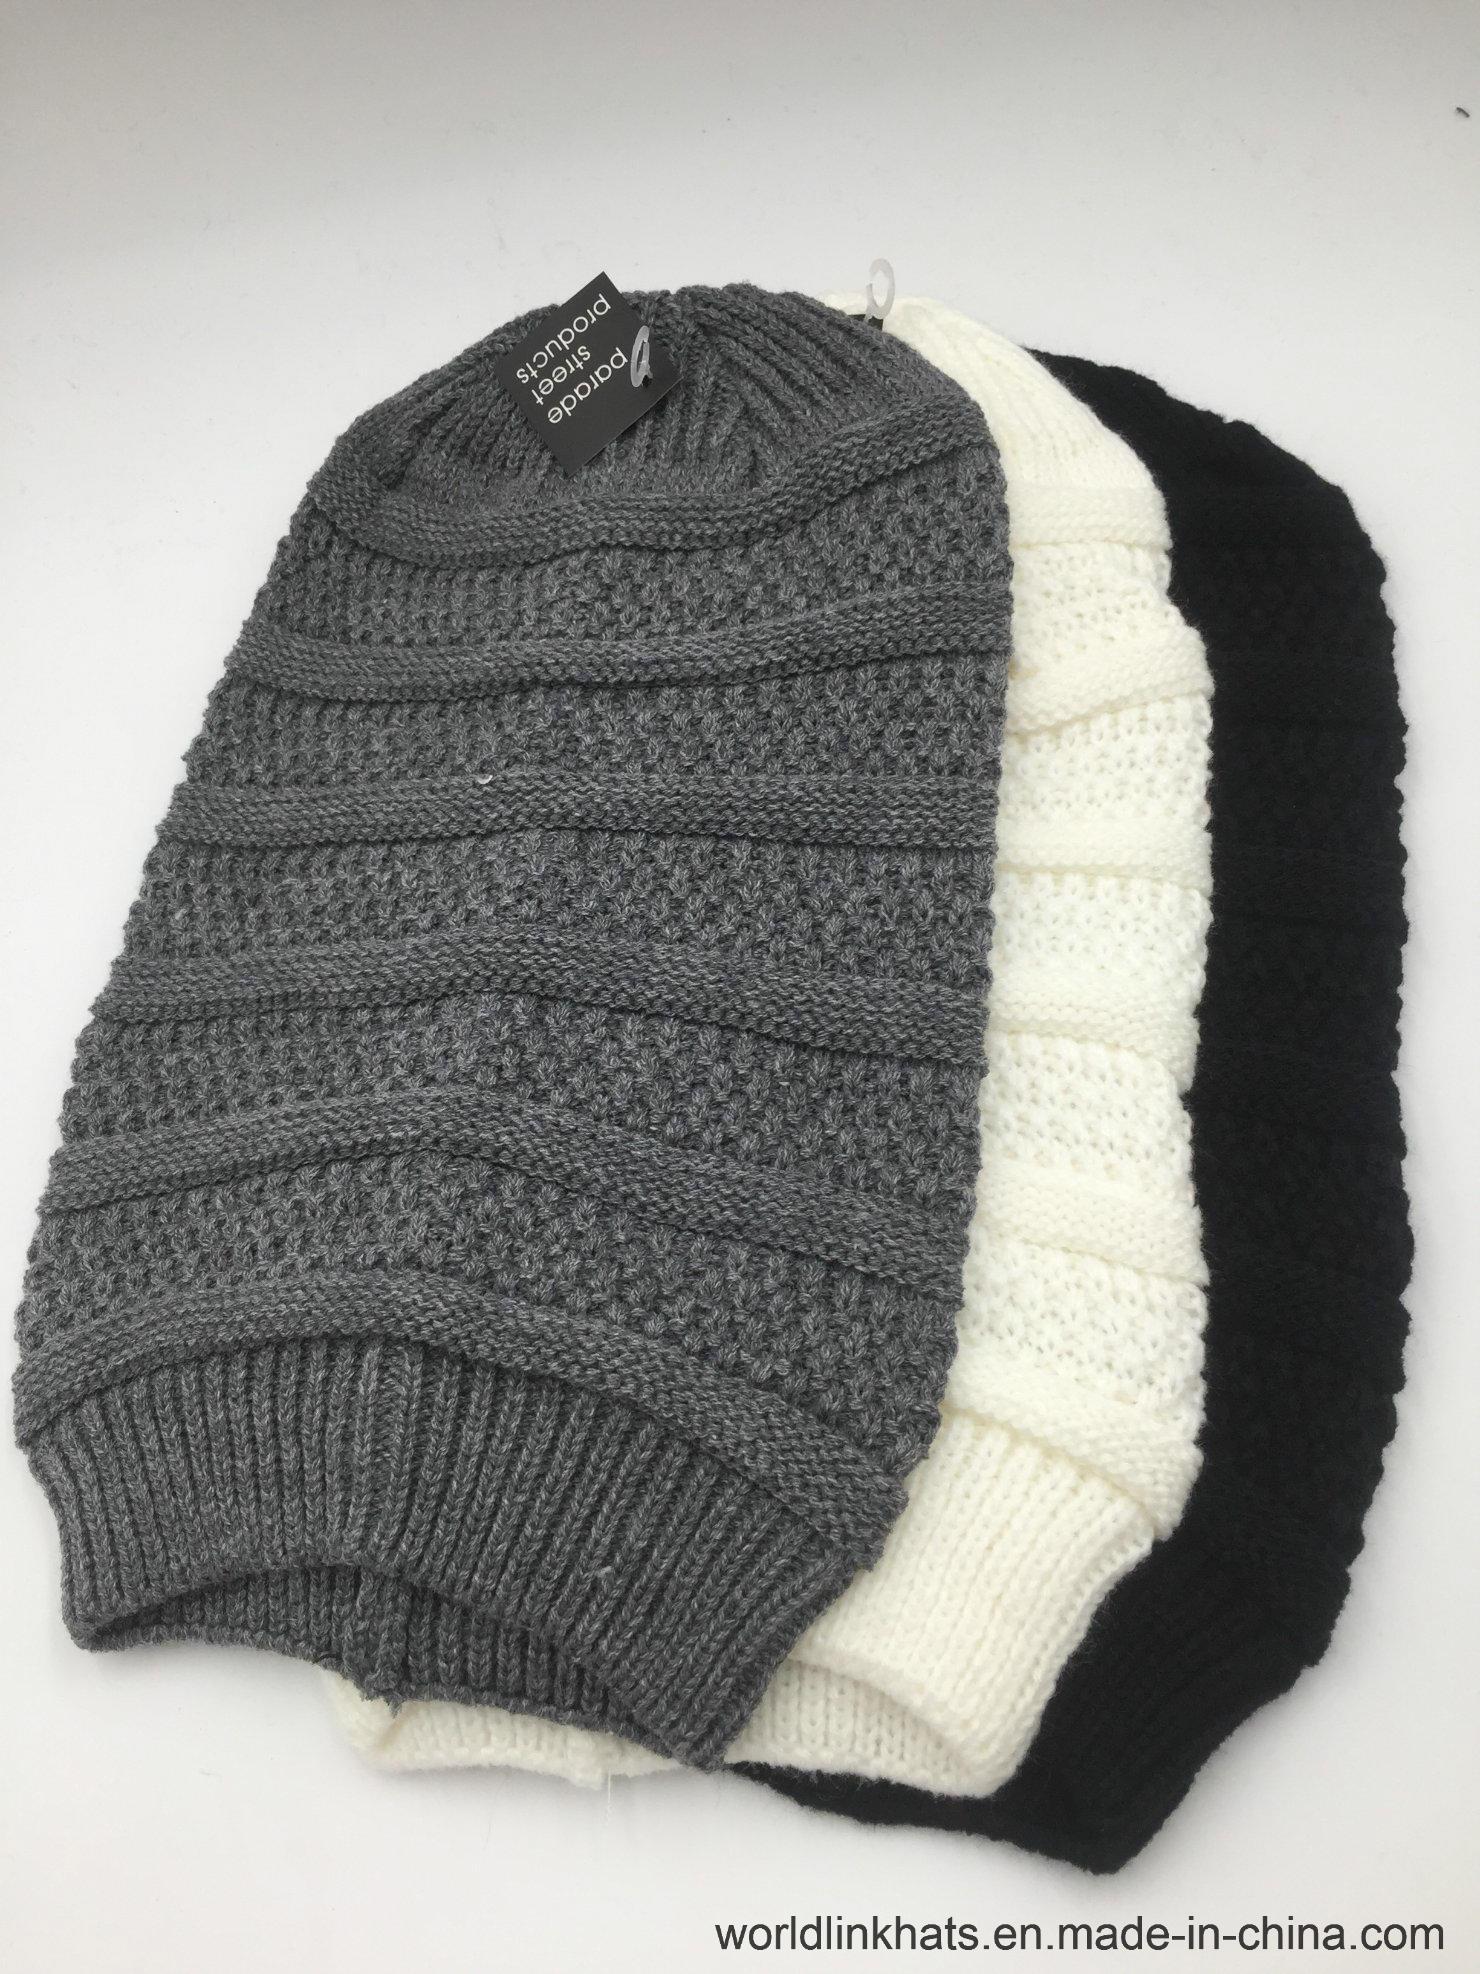 9064d4fc239 China Custom Plain Blank Warm Winter Lengthen Beanie Knitted Cap - China  Lengthen Beanie Hat